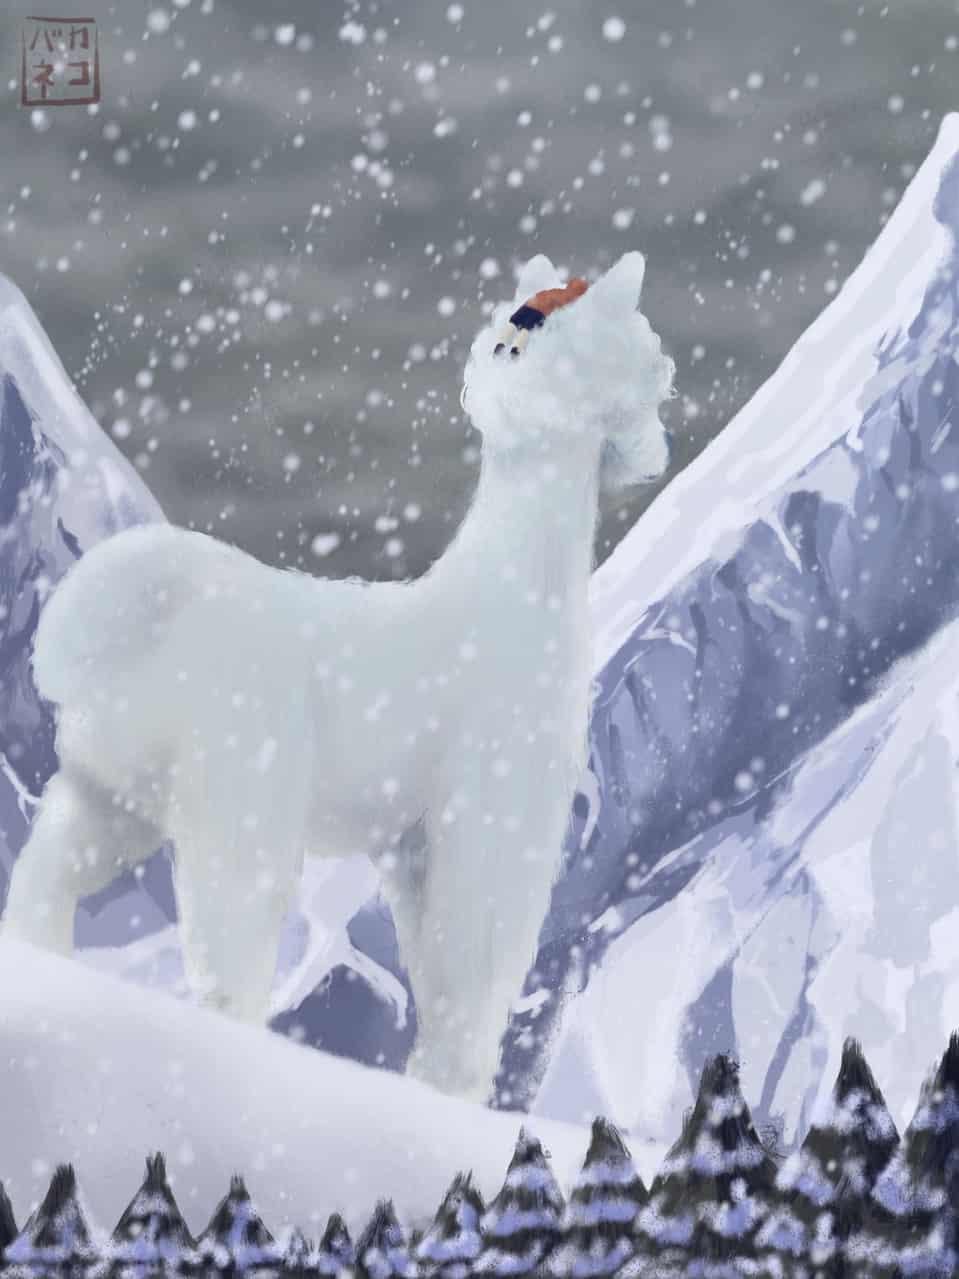 Winter wonderland Illust of madishon [マデ] September2020_Contest:Furry digital painting oc illustration winter